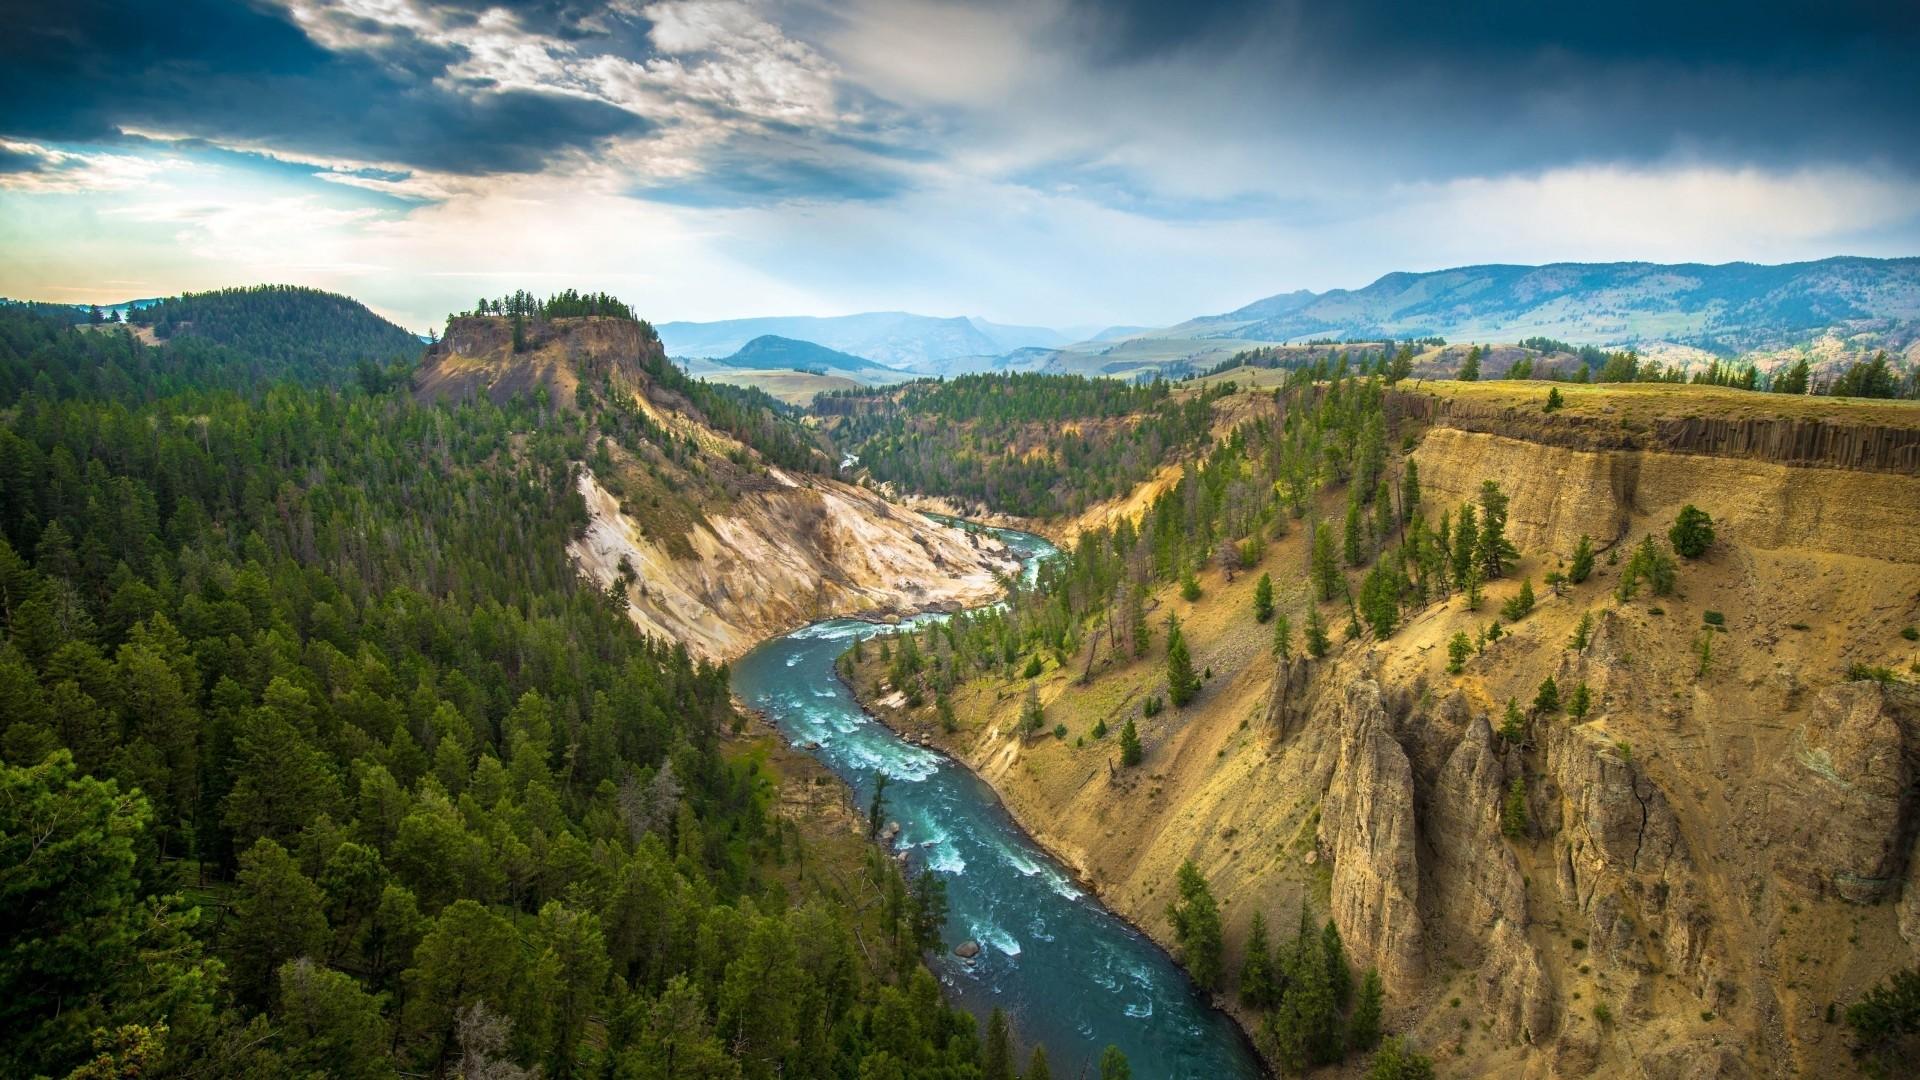 Yellowstone Wallpaper 1920x1080